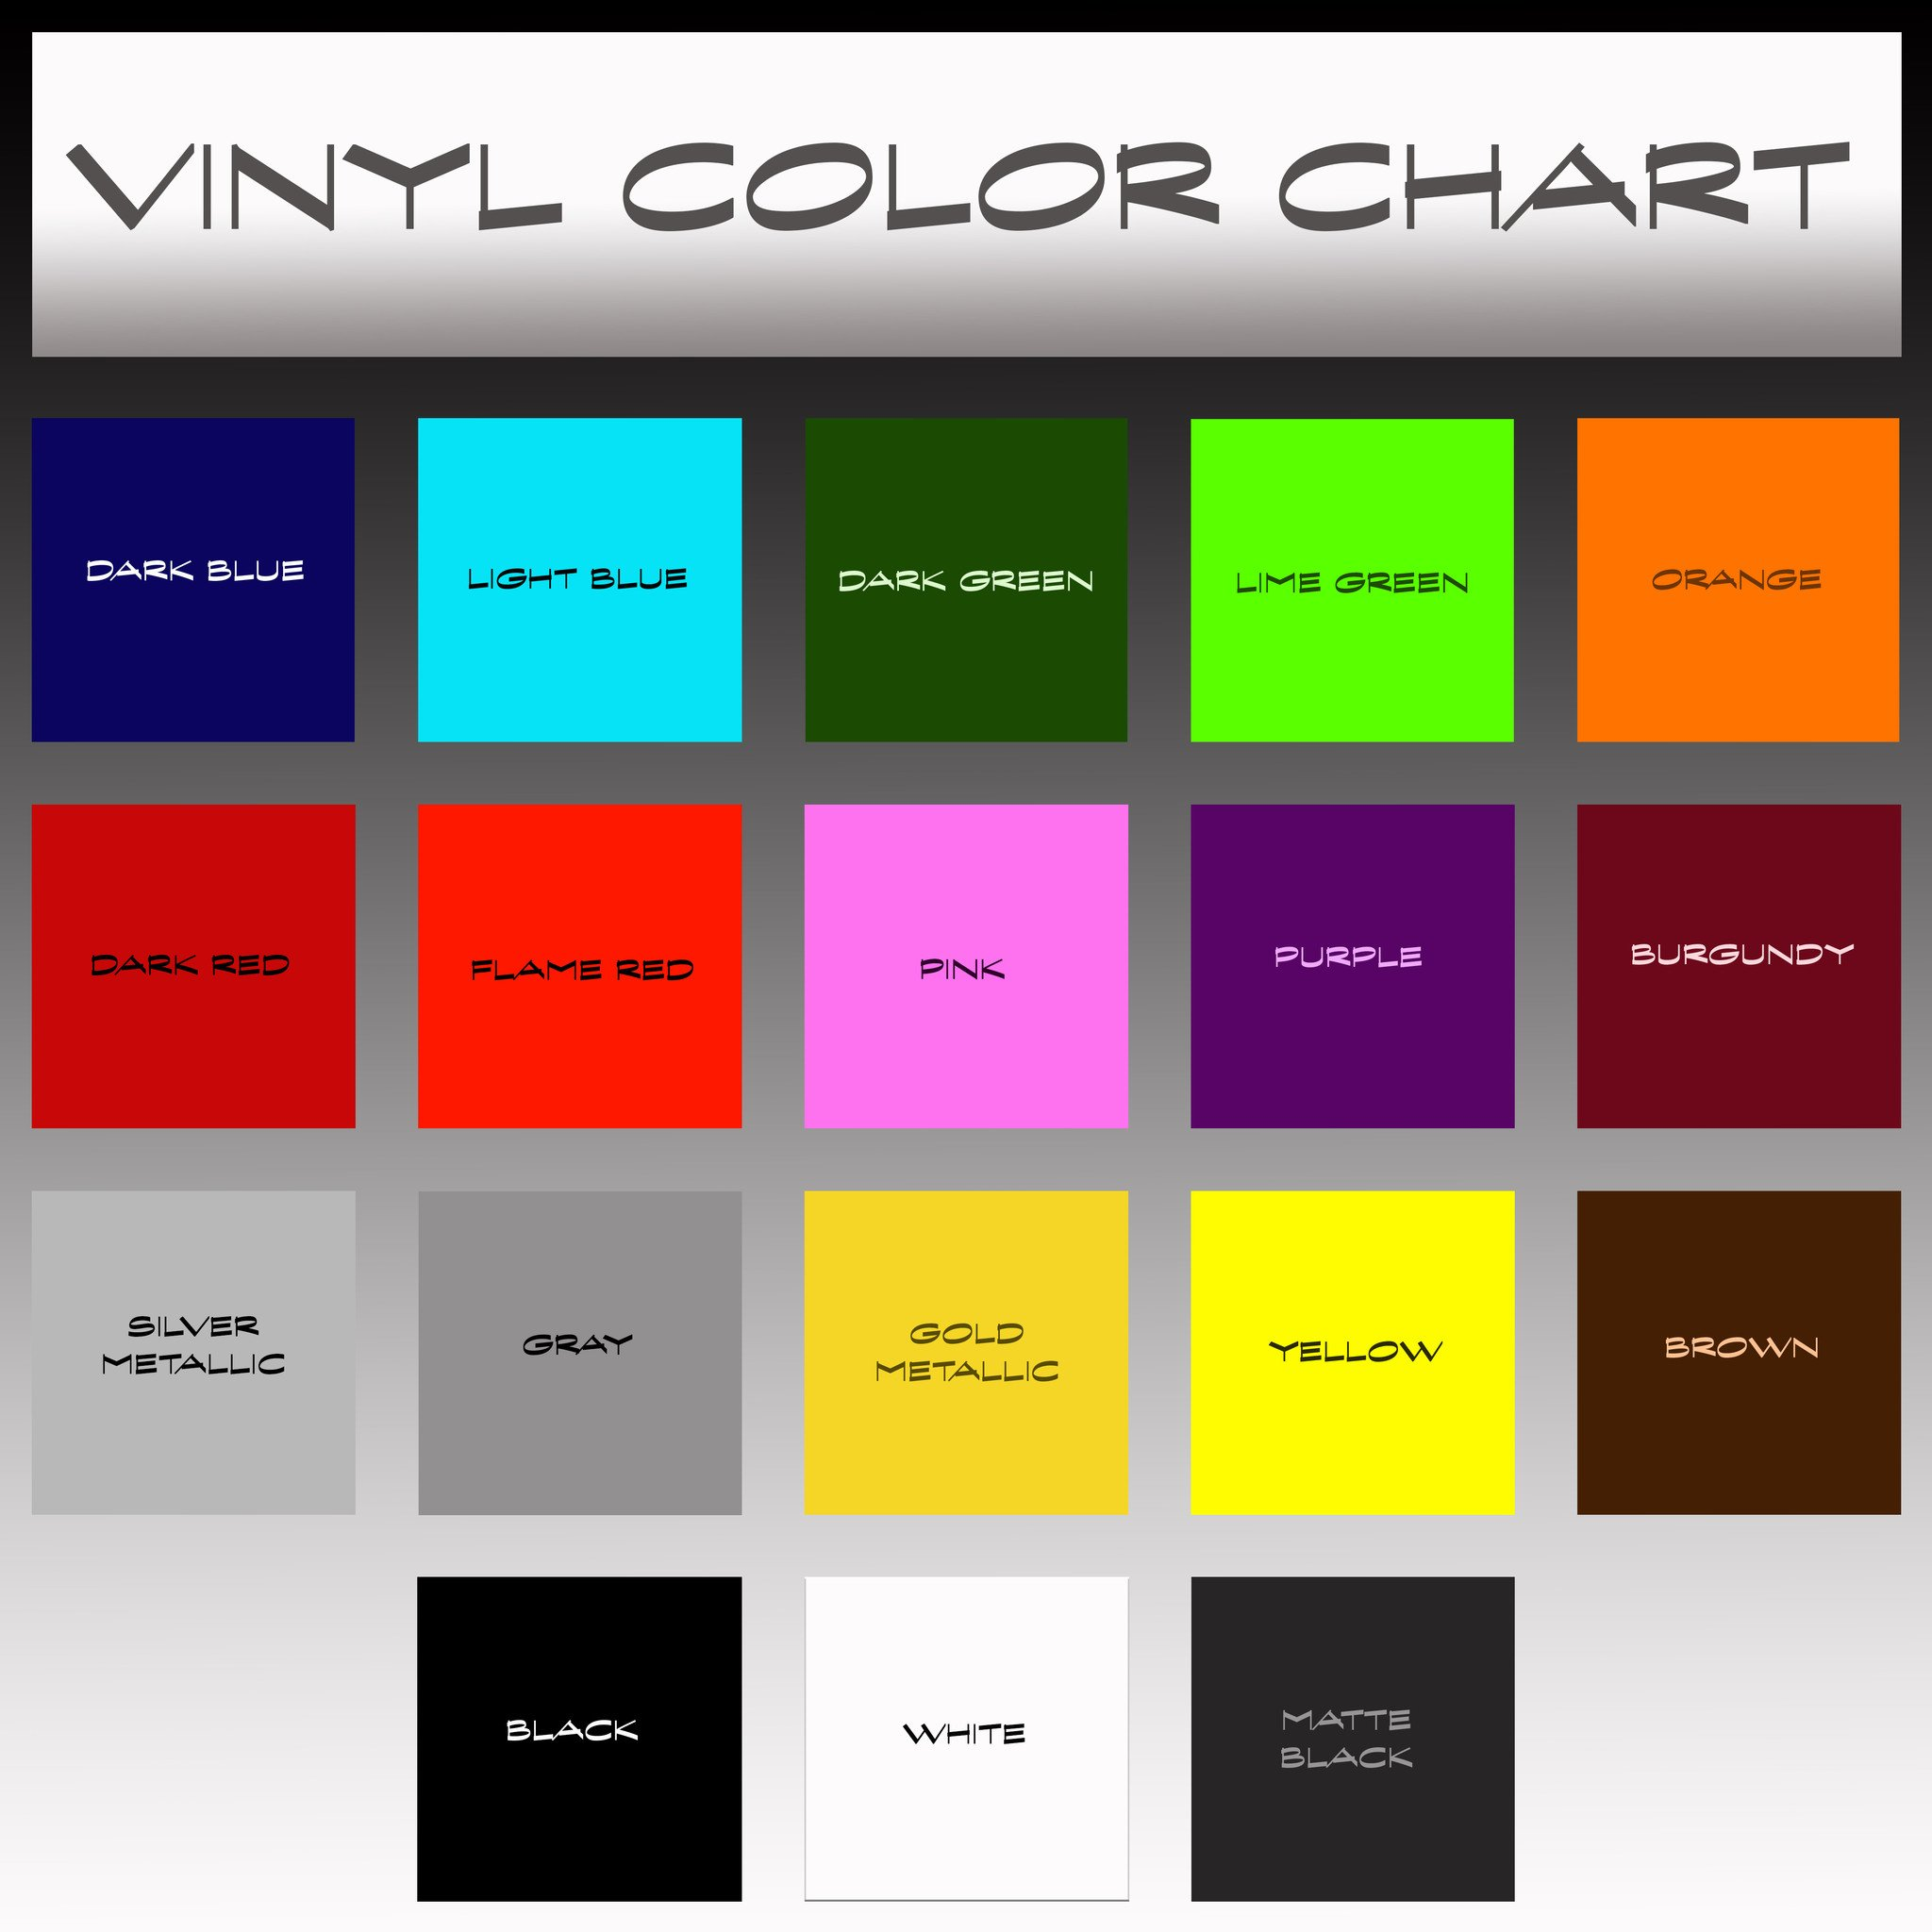 Vinyl Wall Decal Team Work Teamwork Office Business Word Stickers Large Decor (ig4656) Black